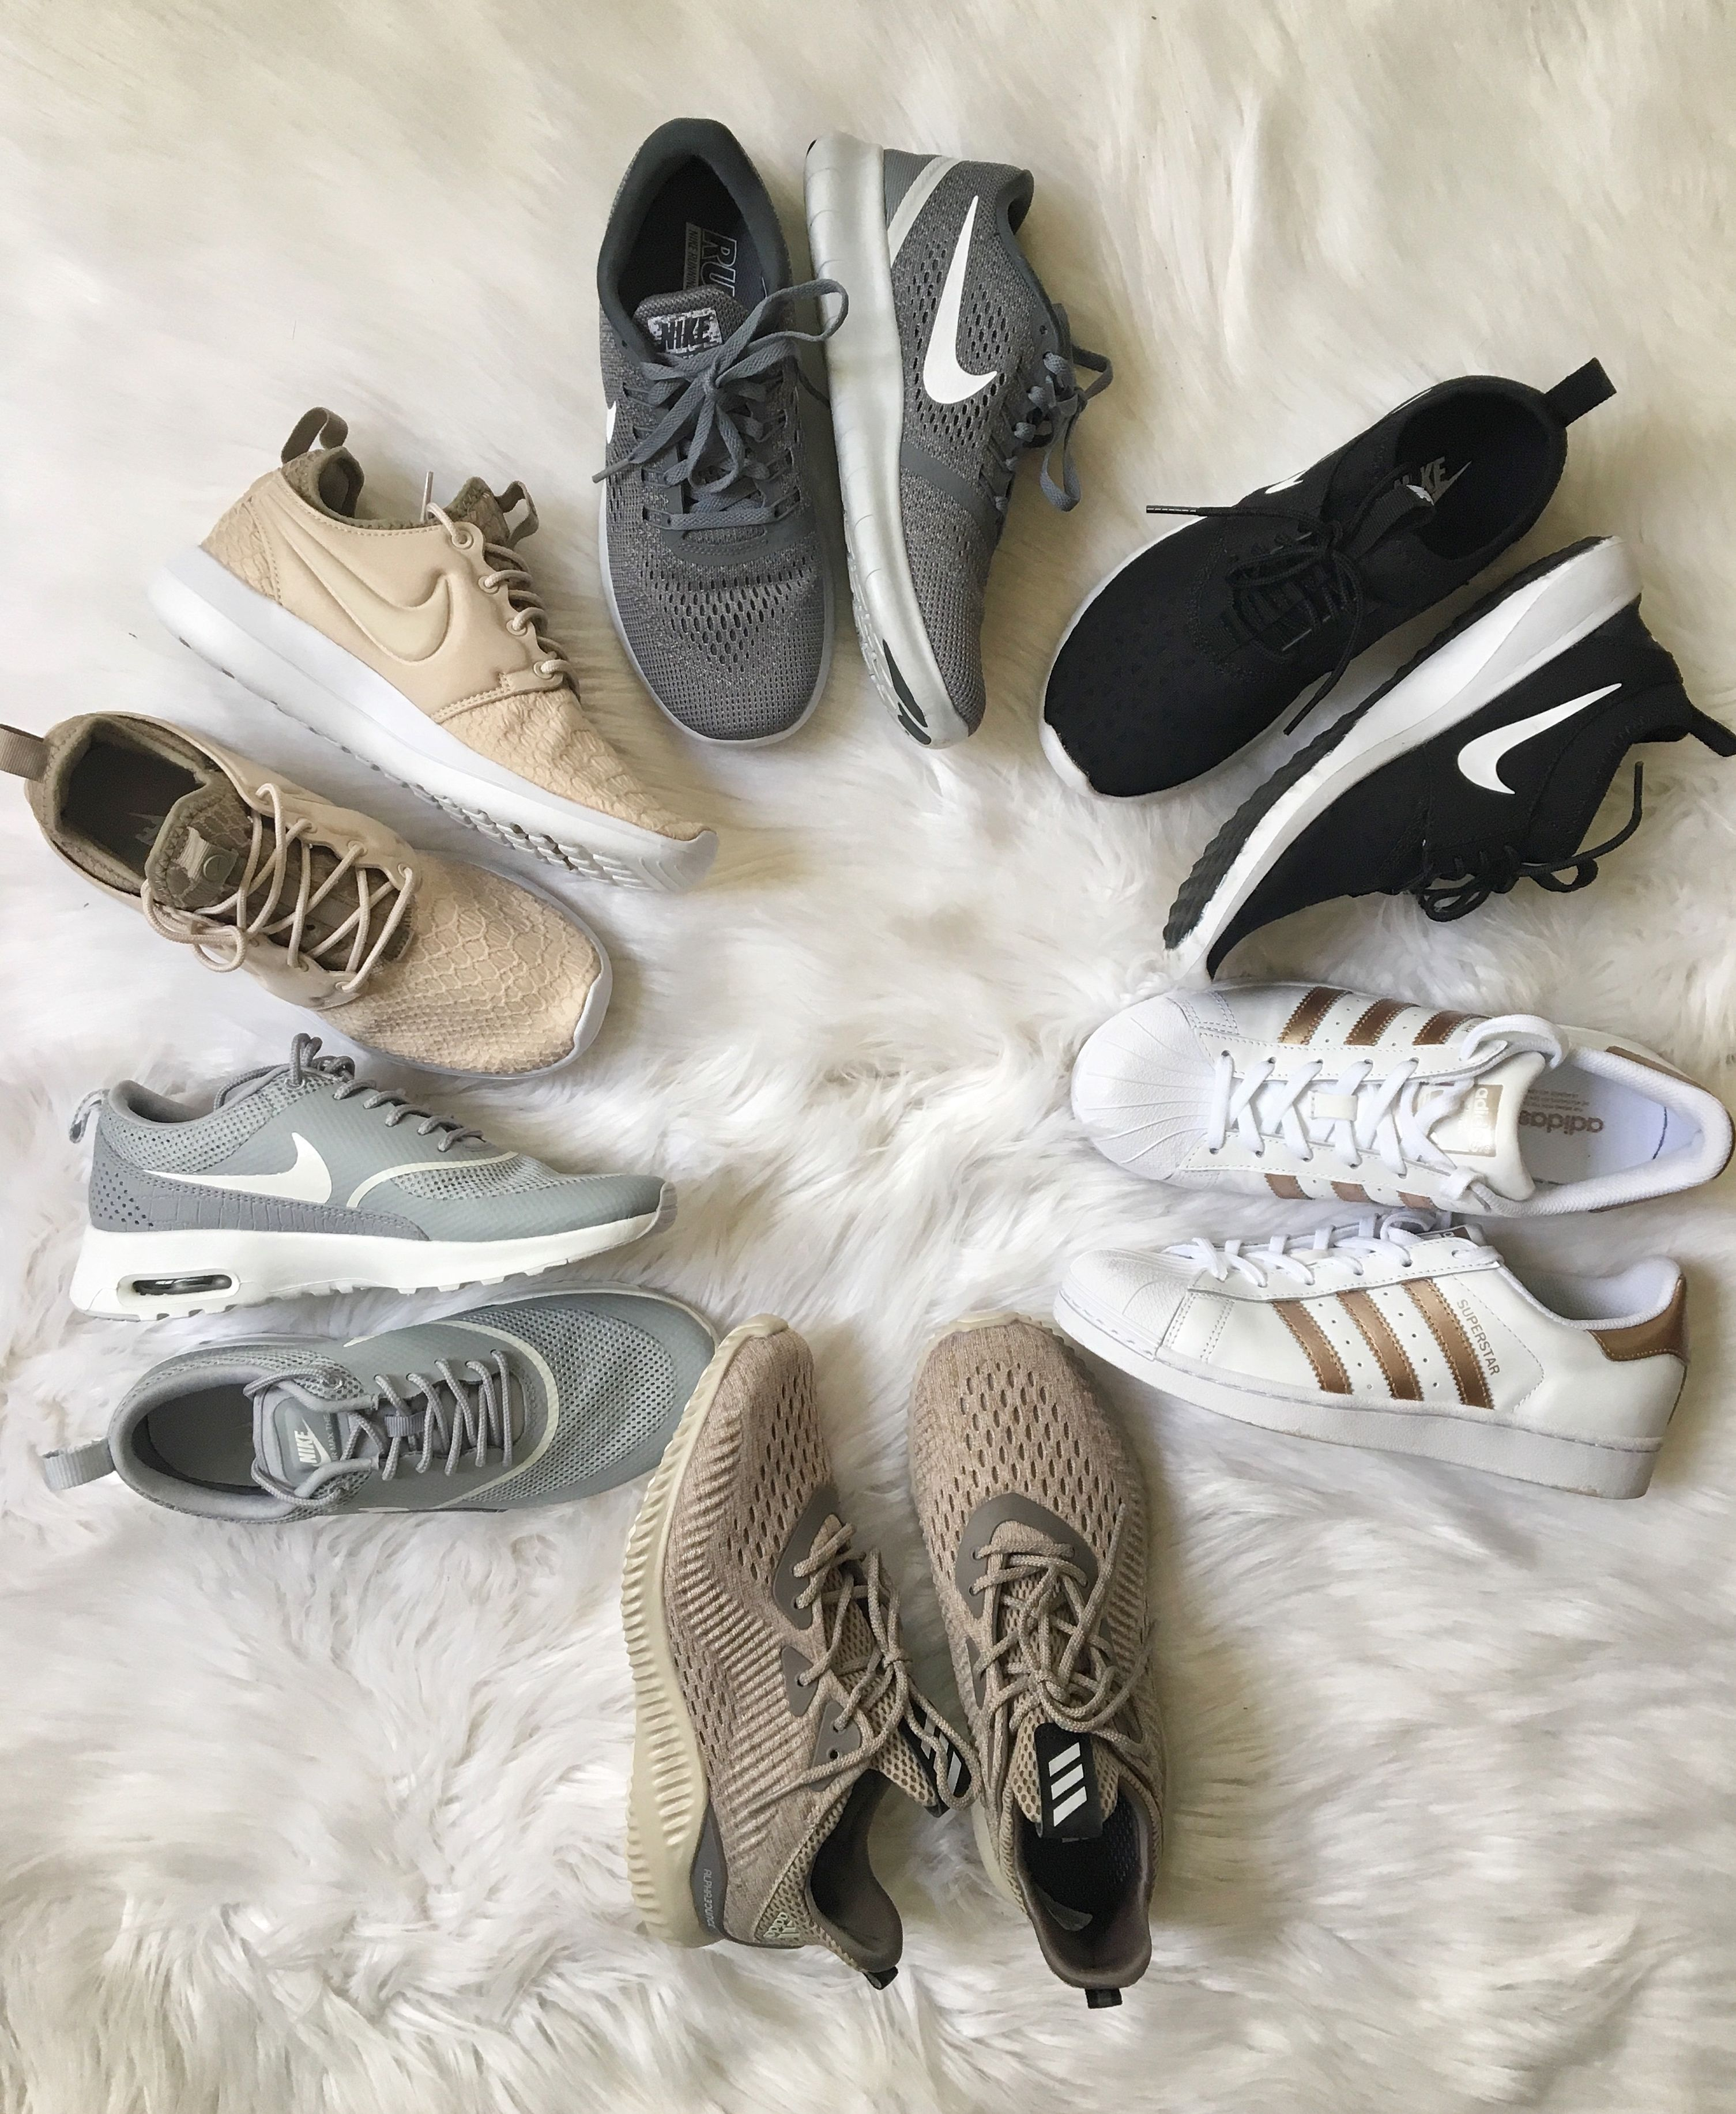 Rack | Best running shoes, Sneakers